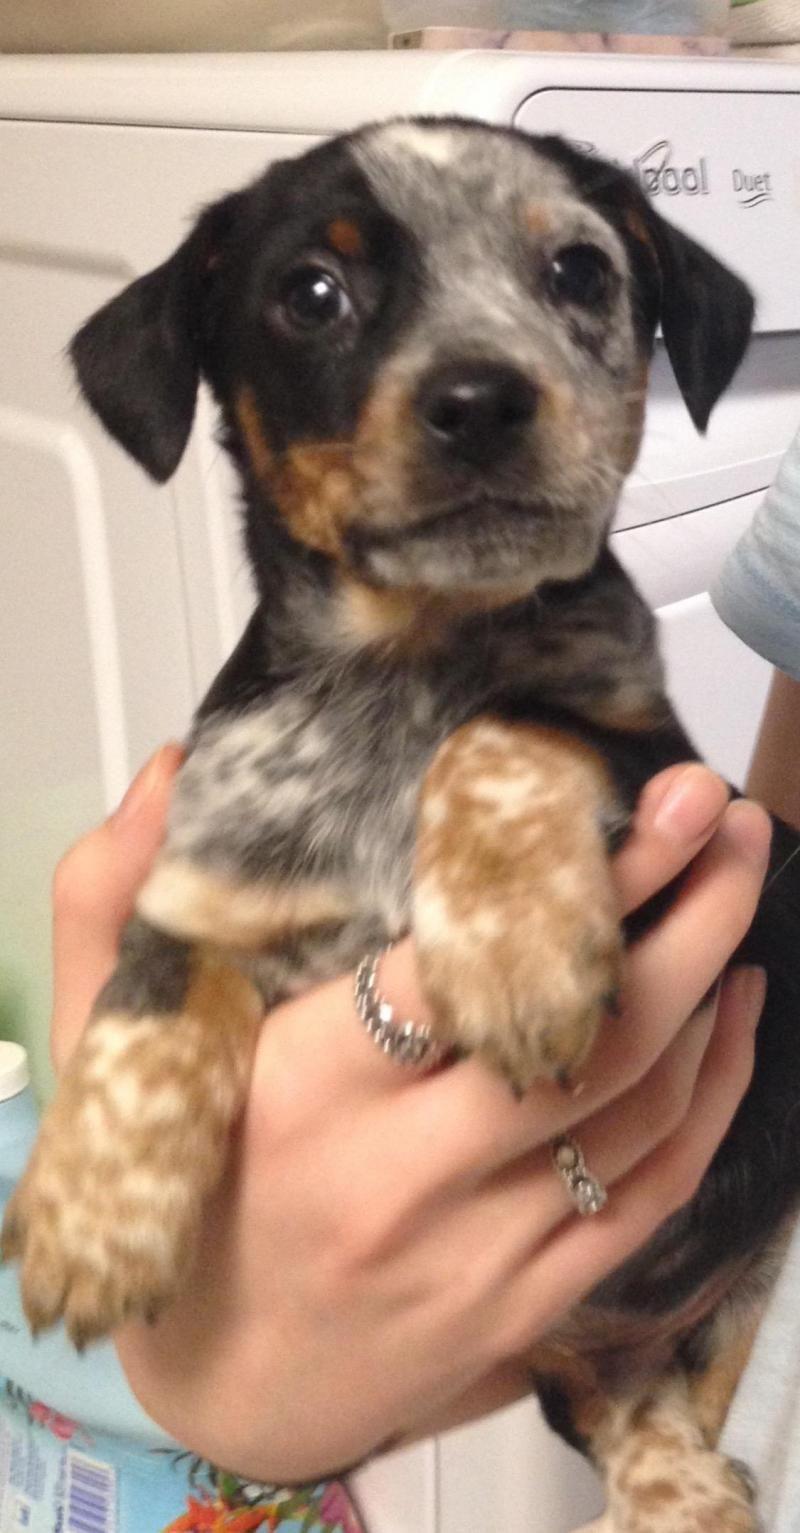 Beagle dachshund mix dachshund mix dachshund dogs